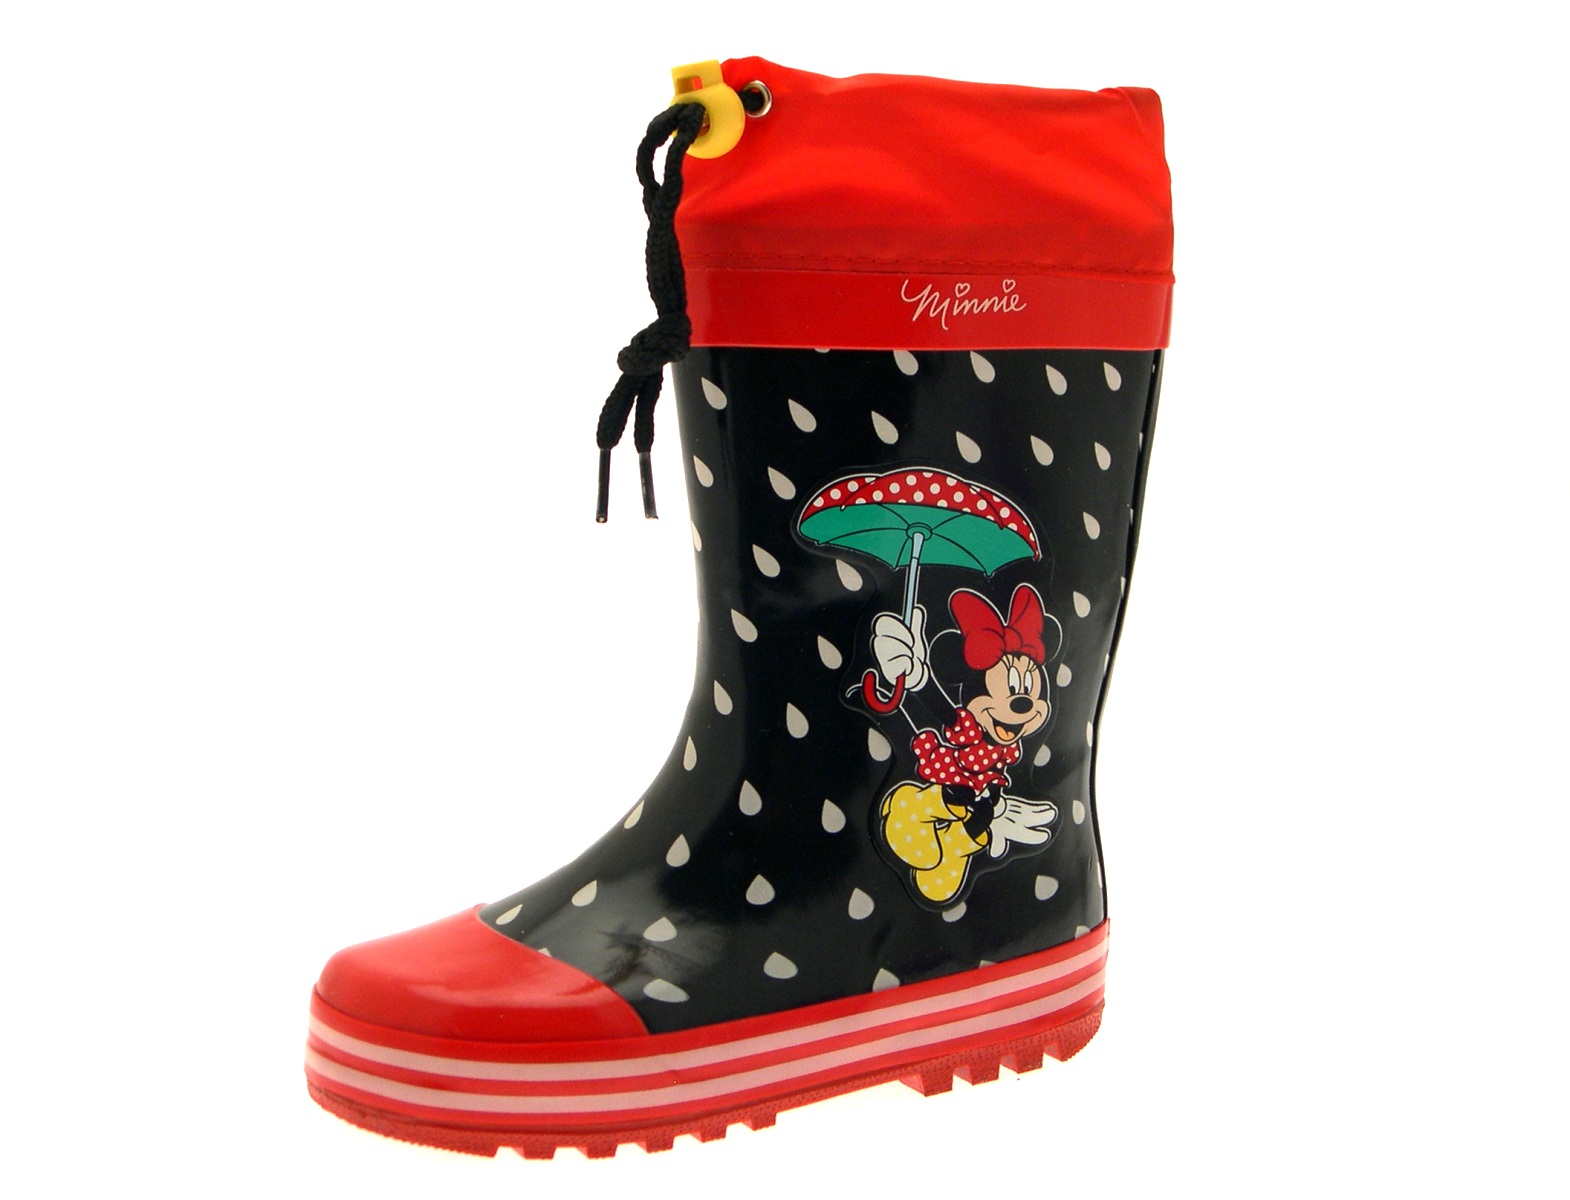 Minnie Mouse Wellies Rubber Snow Wellington Boots Girls Disney Size UK 10 - 2.5